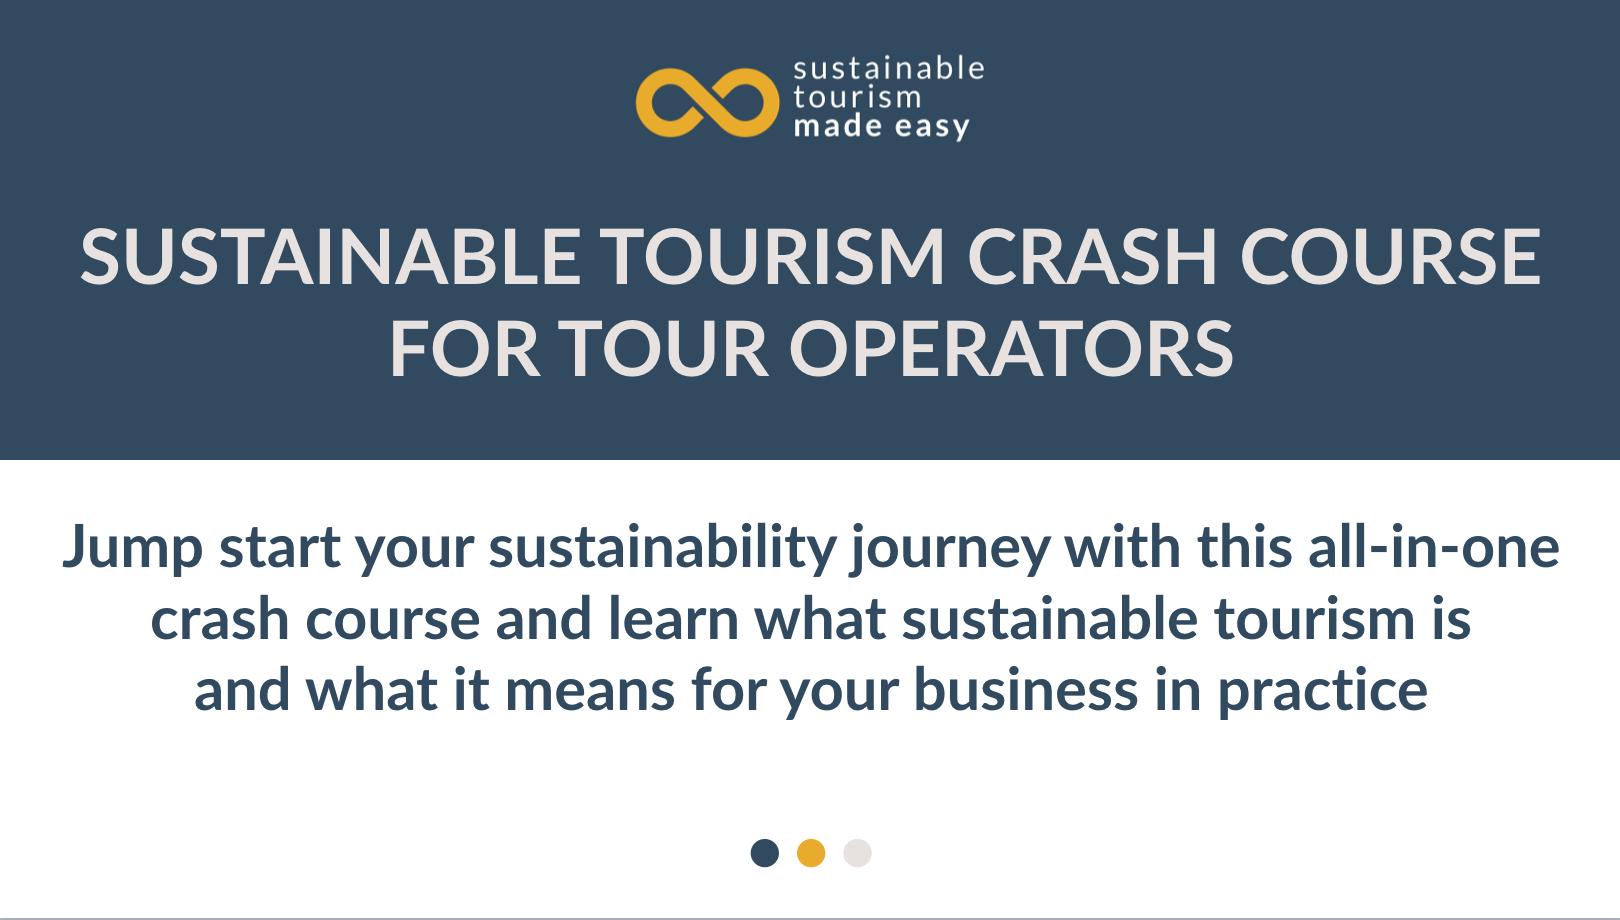 Sustainable tourism crash course for tour operators